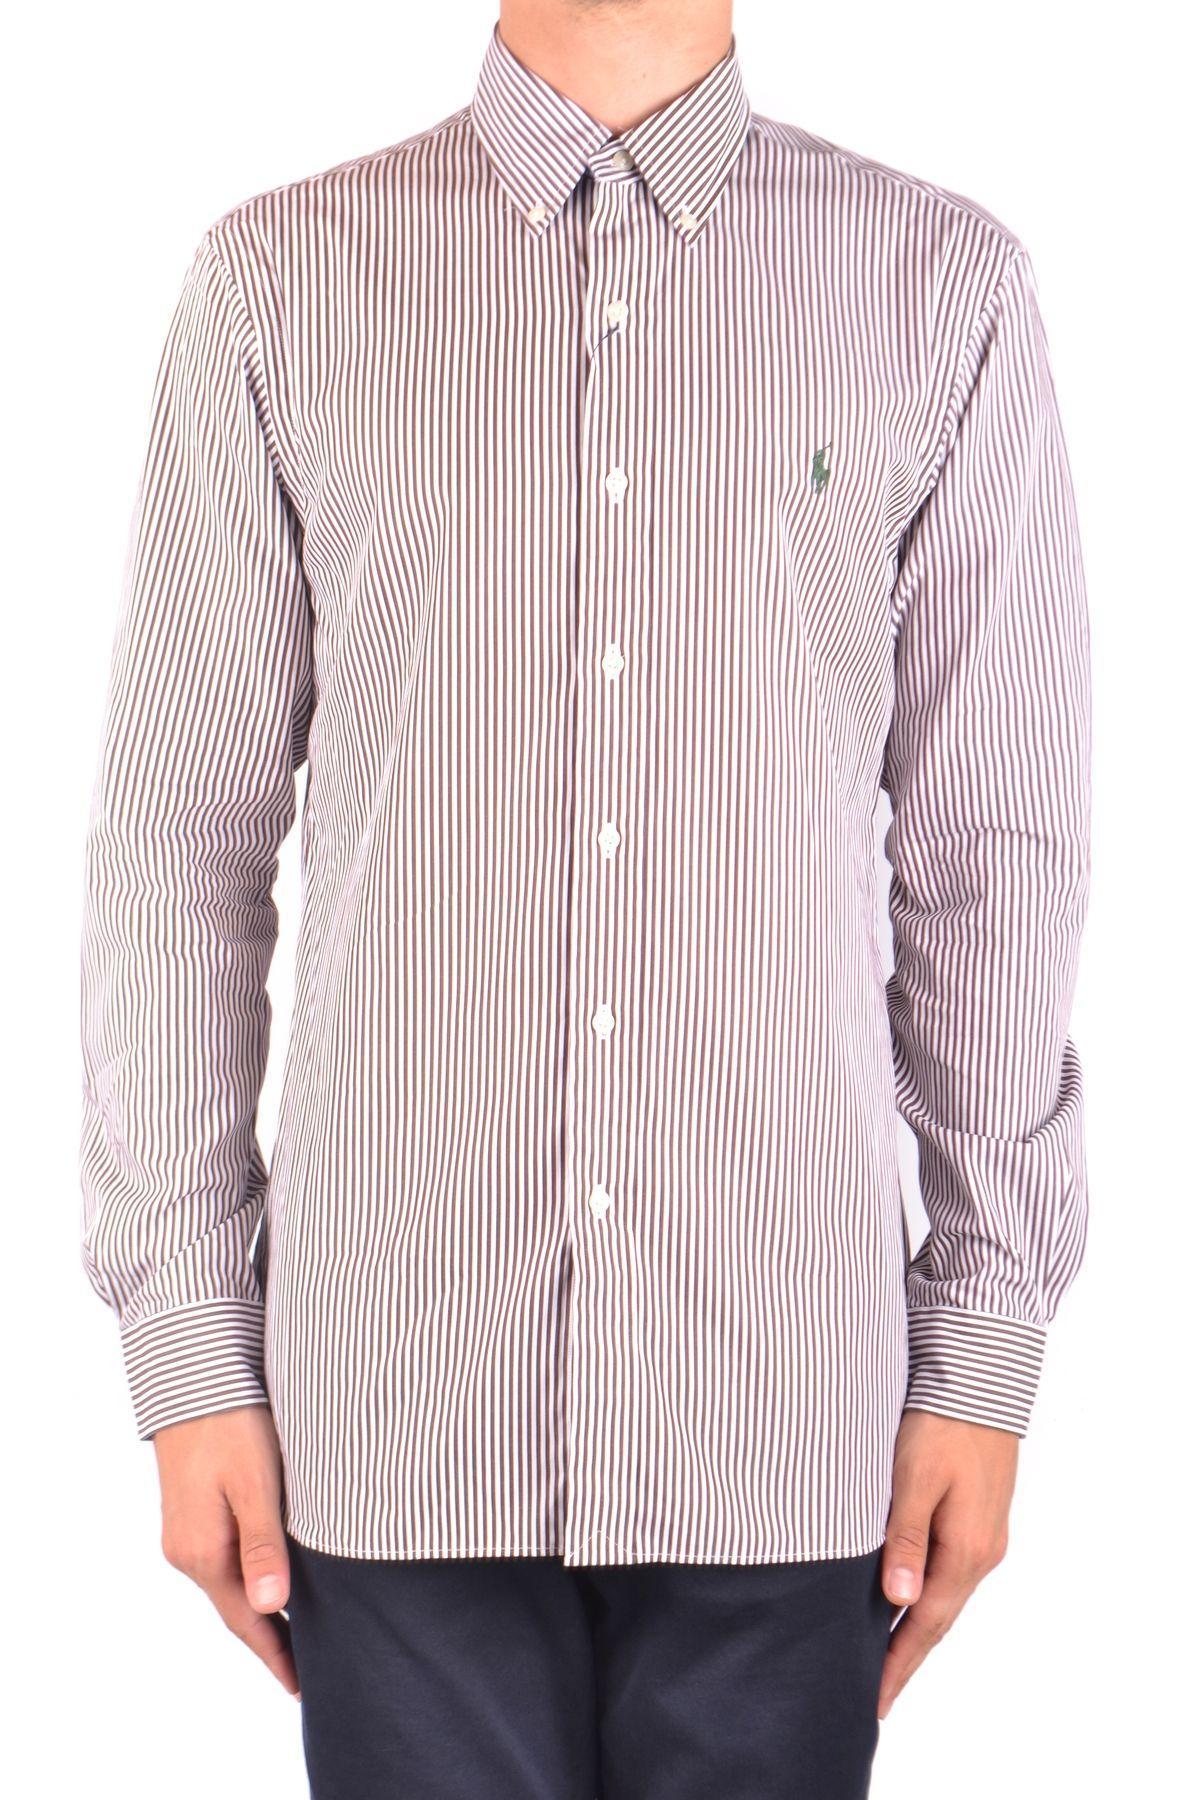 Ralph Lauren Horizontal Striped Polo Shirt in Multicolor